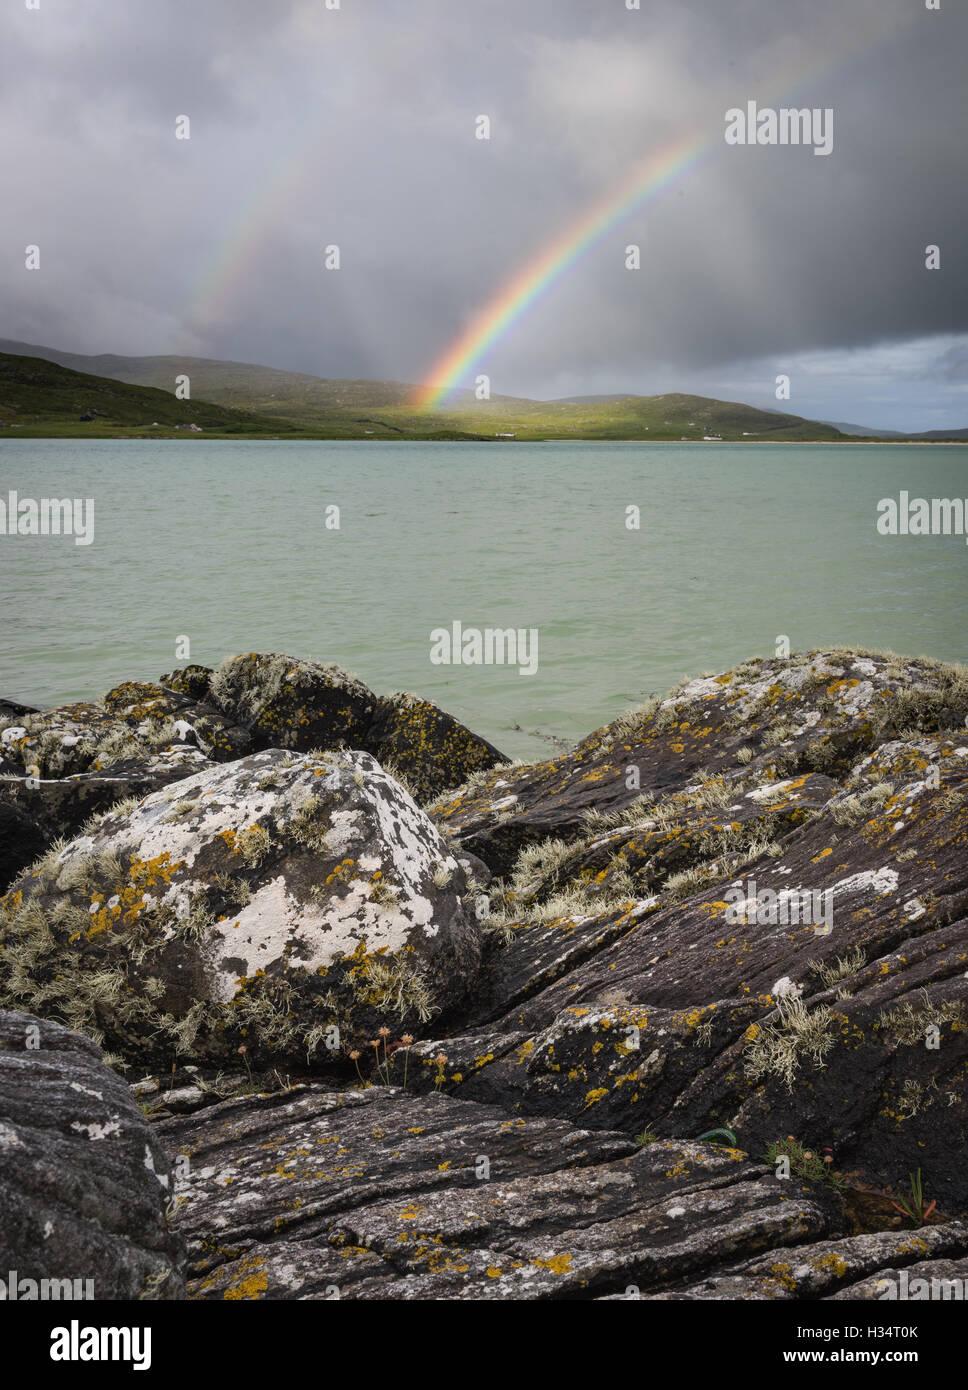 Rainbow over Luskentyre, Isle of Harris, Outer Hebrides, Scotland - Stock Image